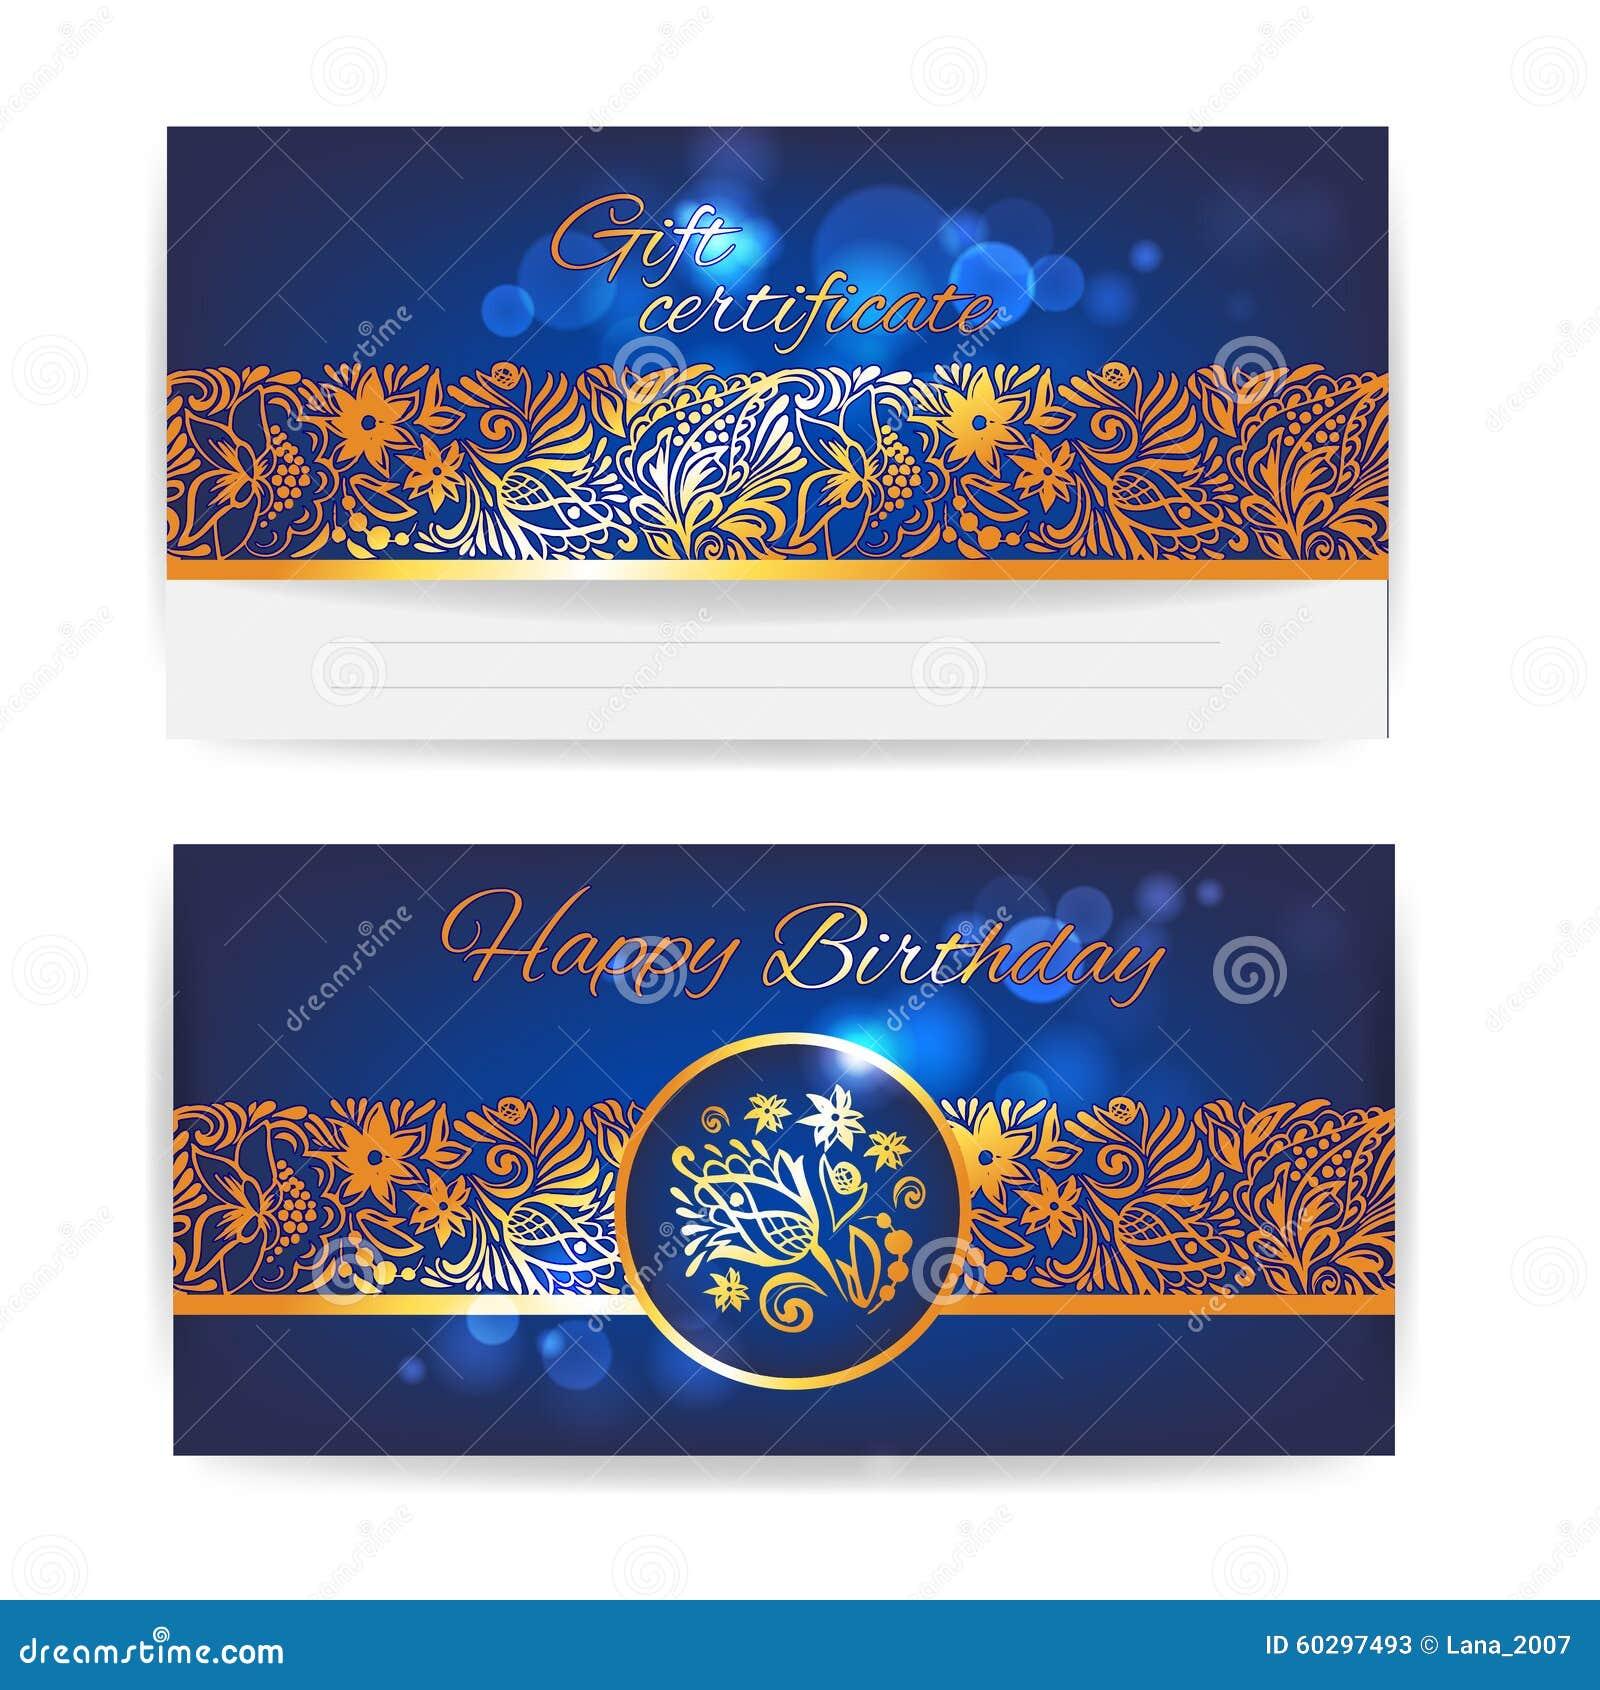 gift certificate floral design vector print template stock vector image 60297493. Black Bedroom Furniture Sets. Home Design Ideas